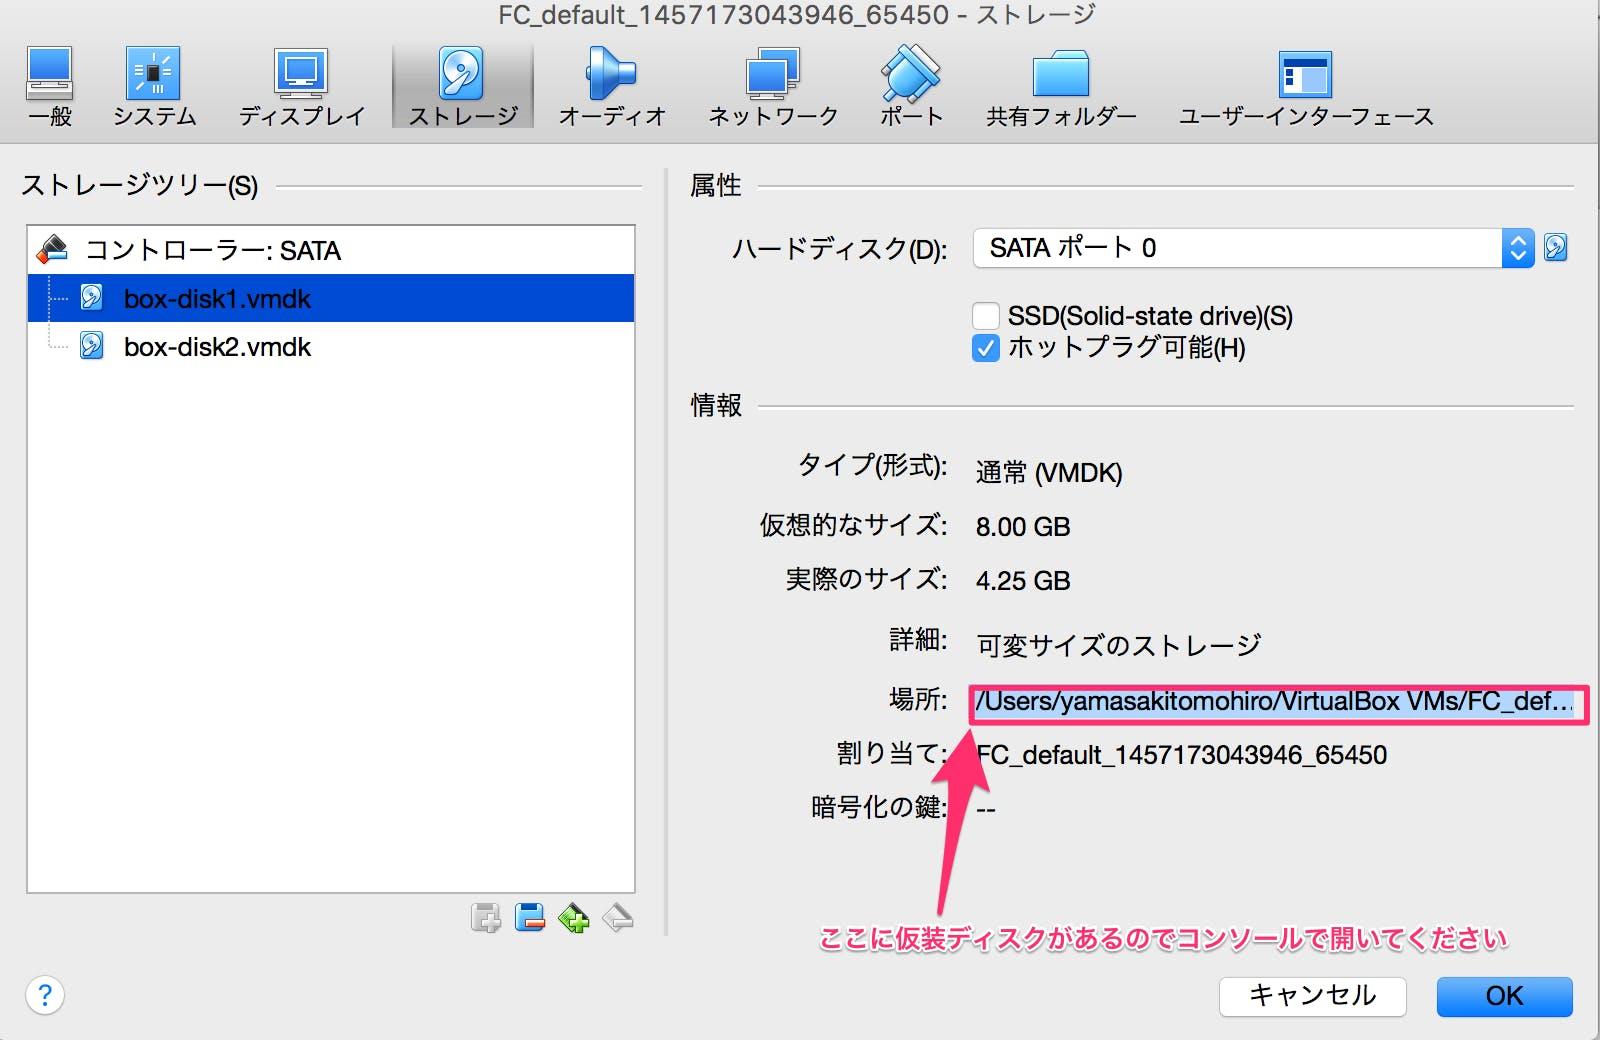 FC_default_1457173043946_65450_-_ストレージ_と_Oracle_VM_VirtualBox_マネージャー.png